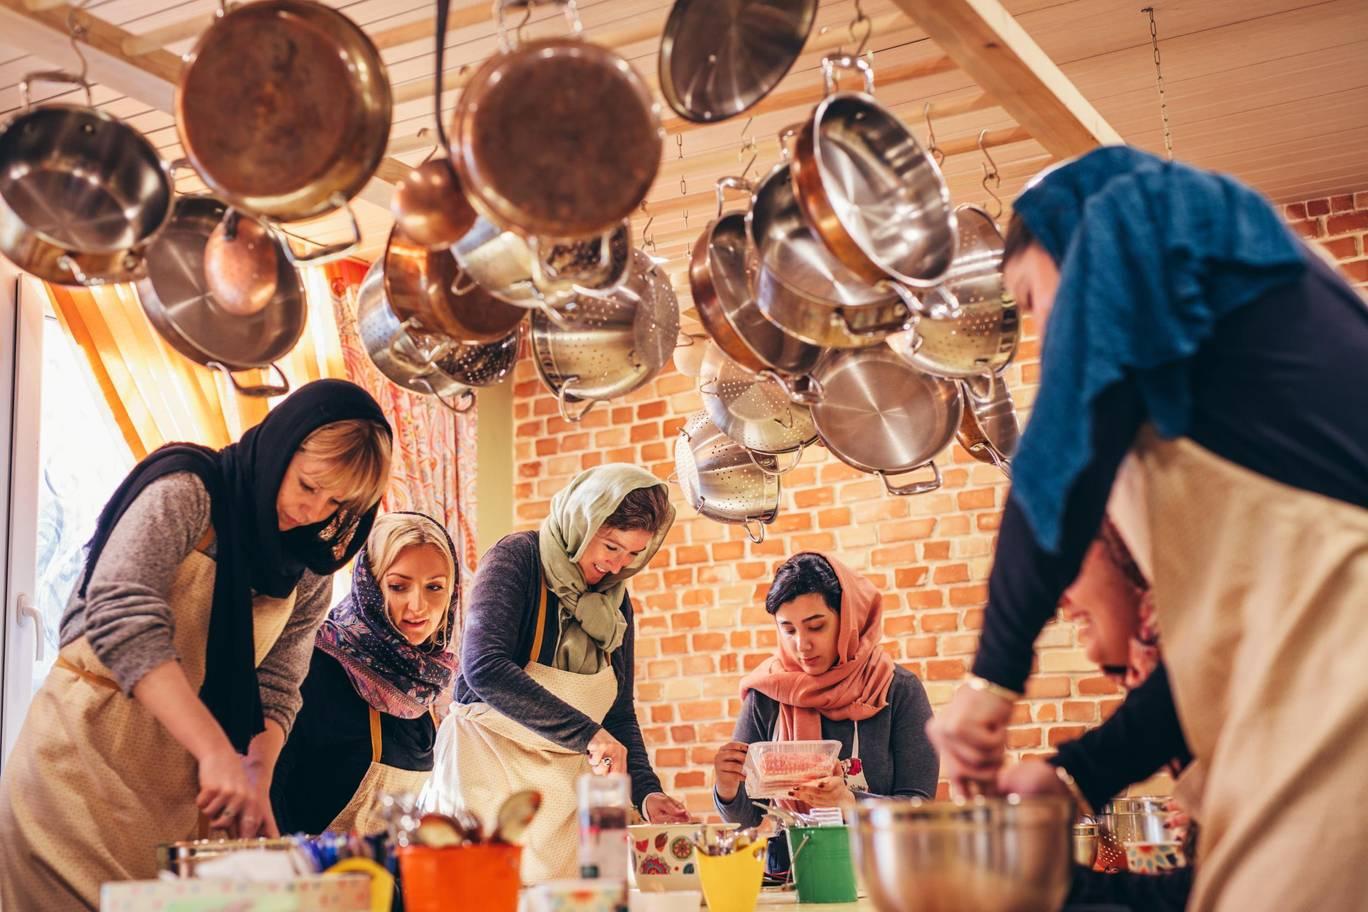 intrepid-travel-iran-tehran-cooking-class-hr-049a2278.jpg